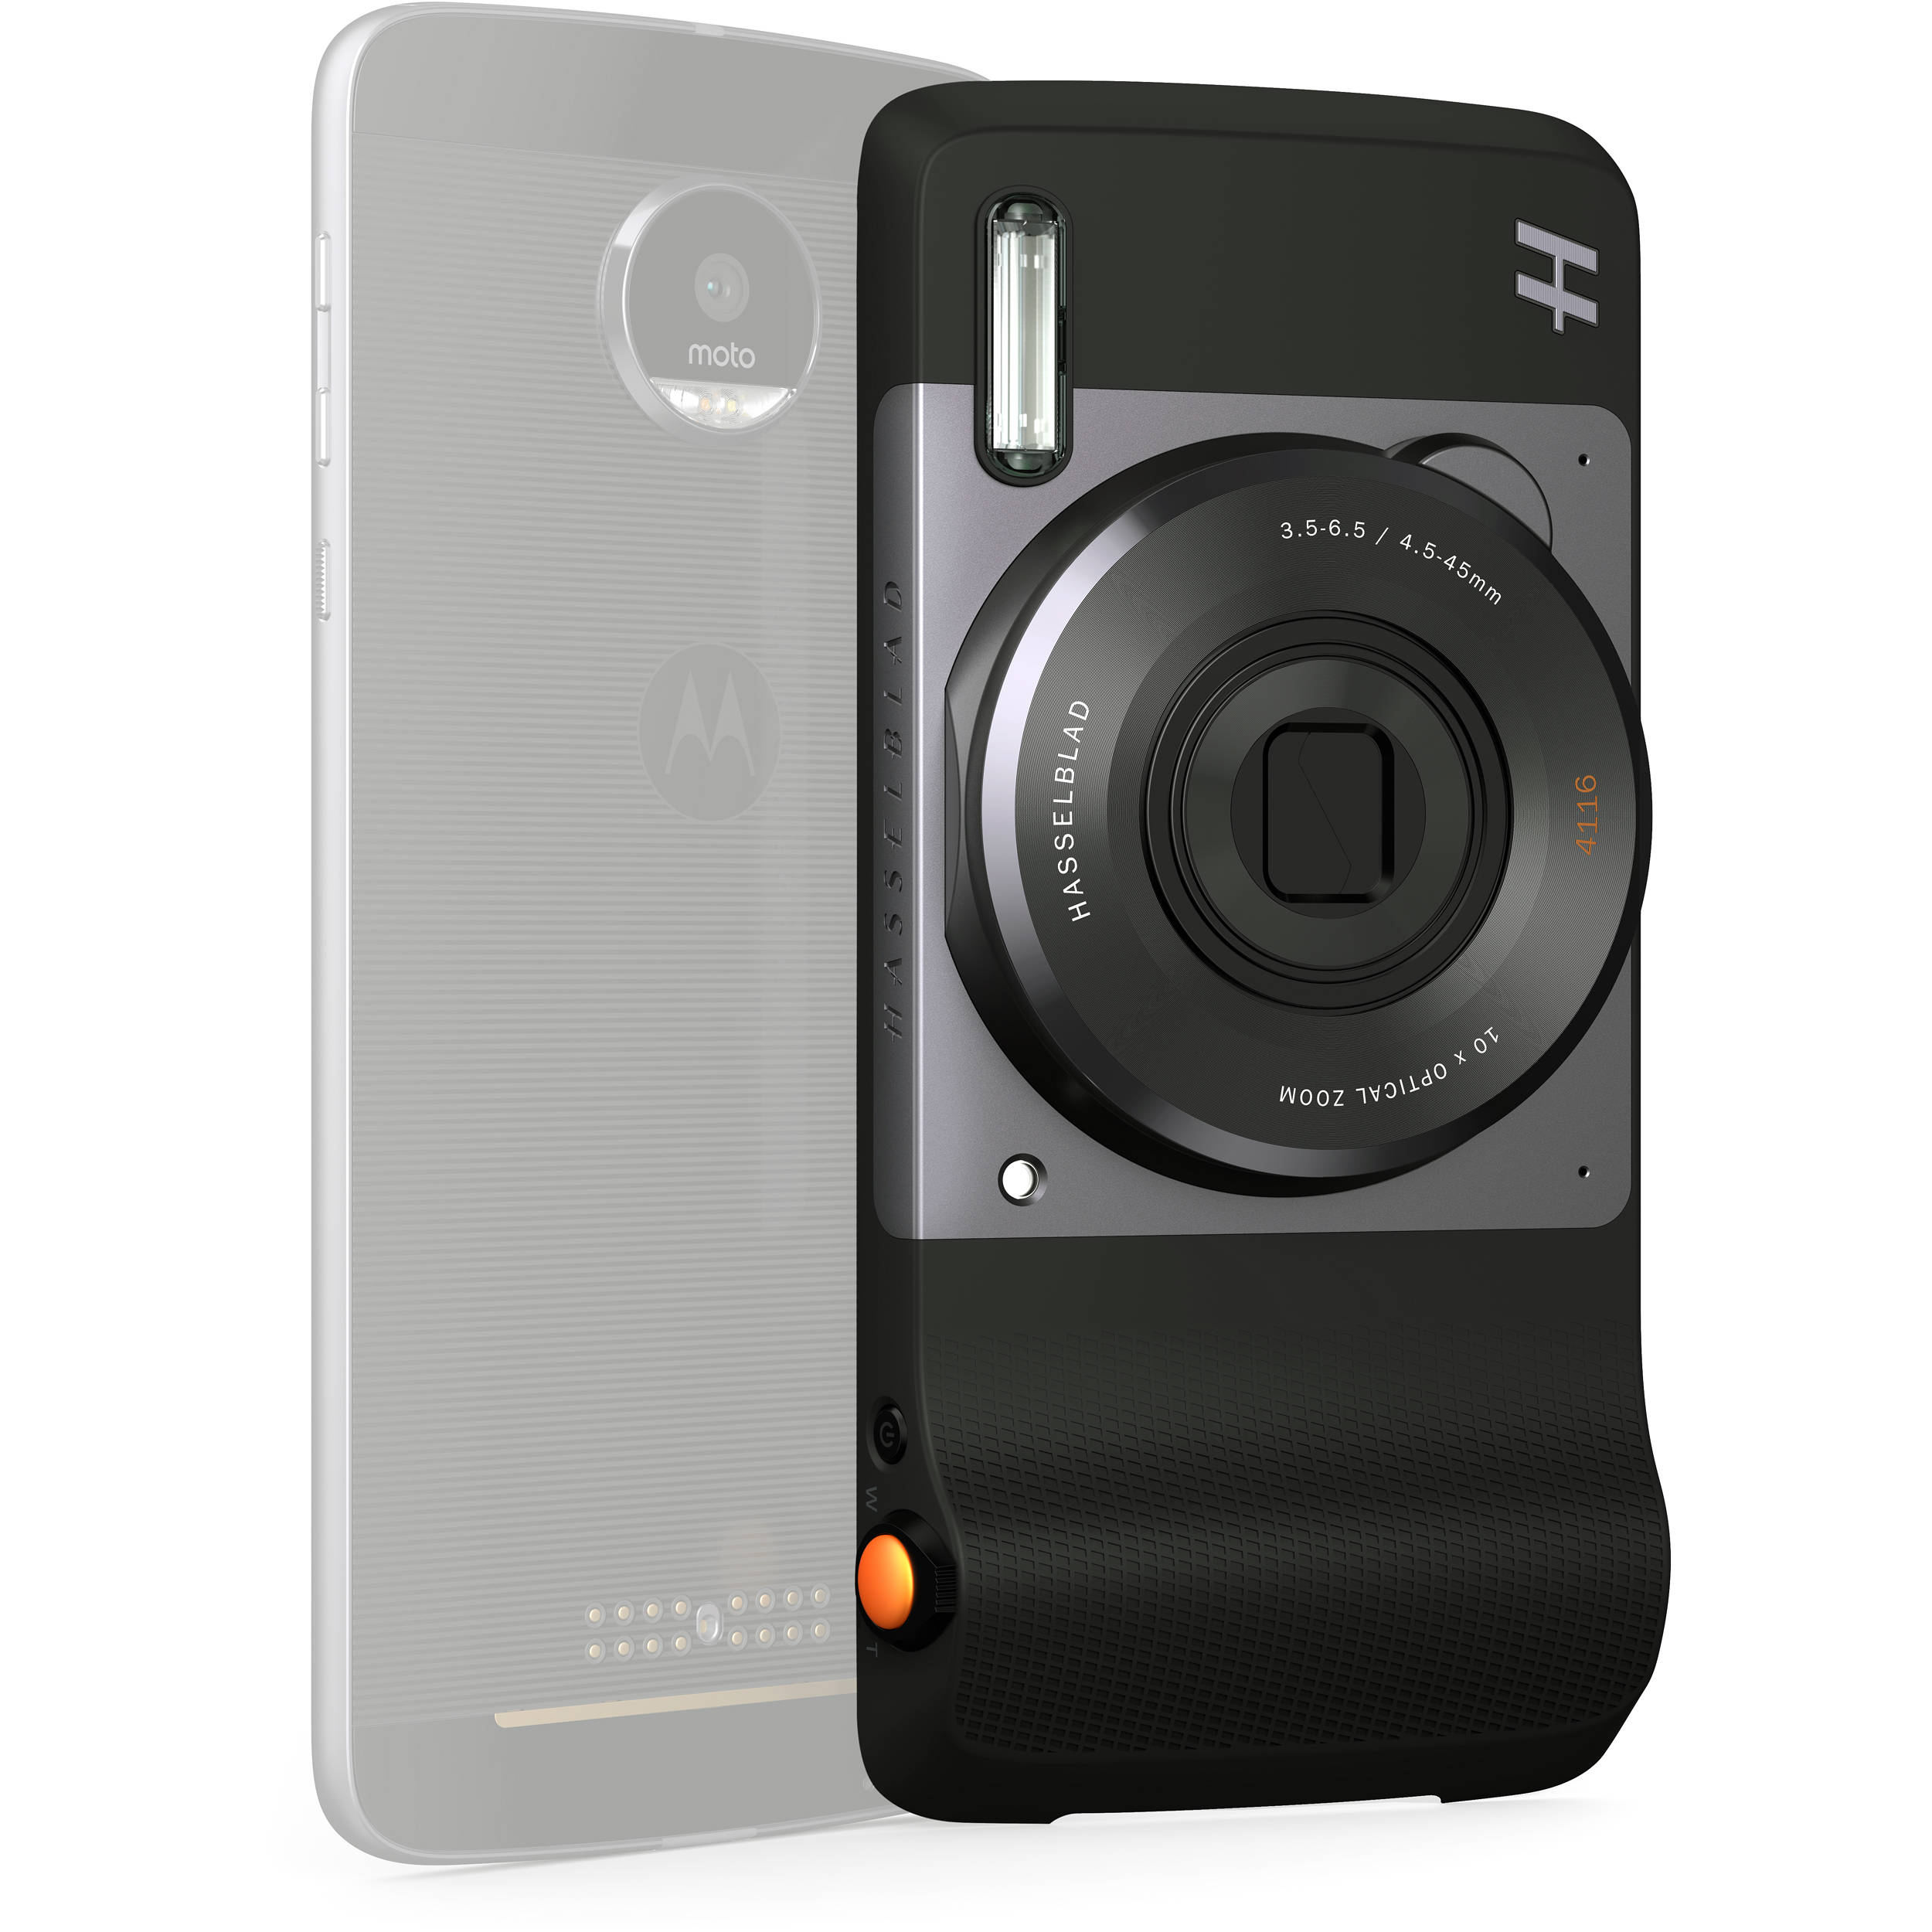 sports shoes 0a9a6 ef0c0 Hasselblad True Zoom Camera for Motorola Z Smartphones